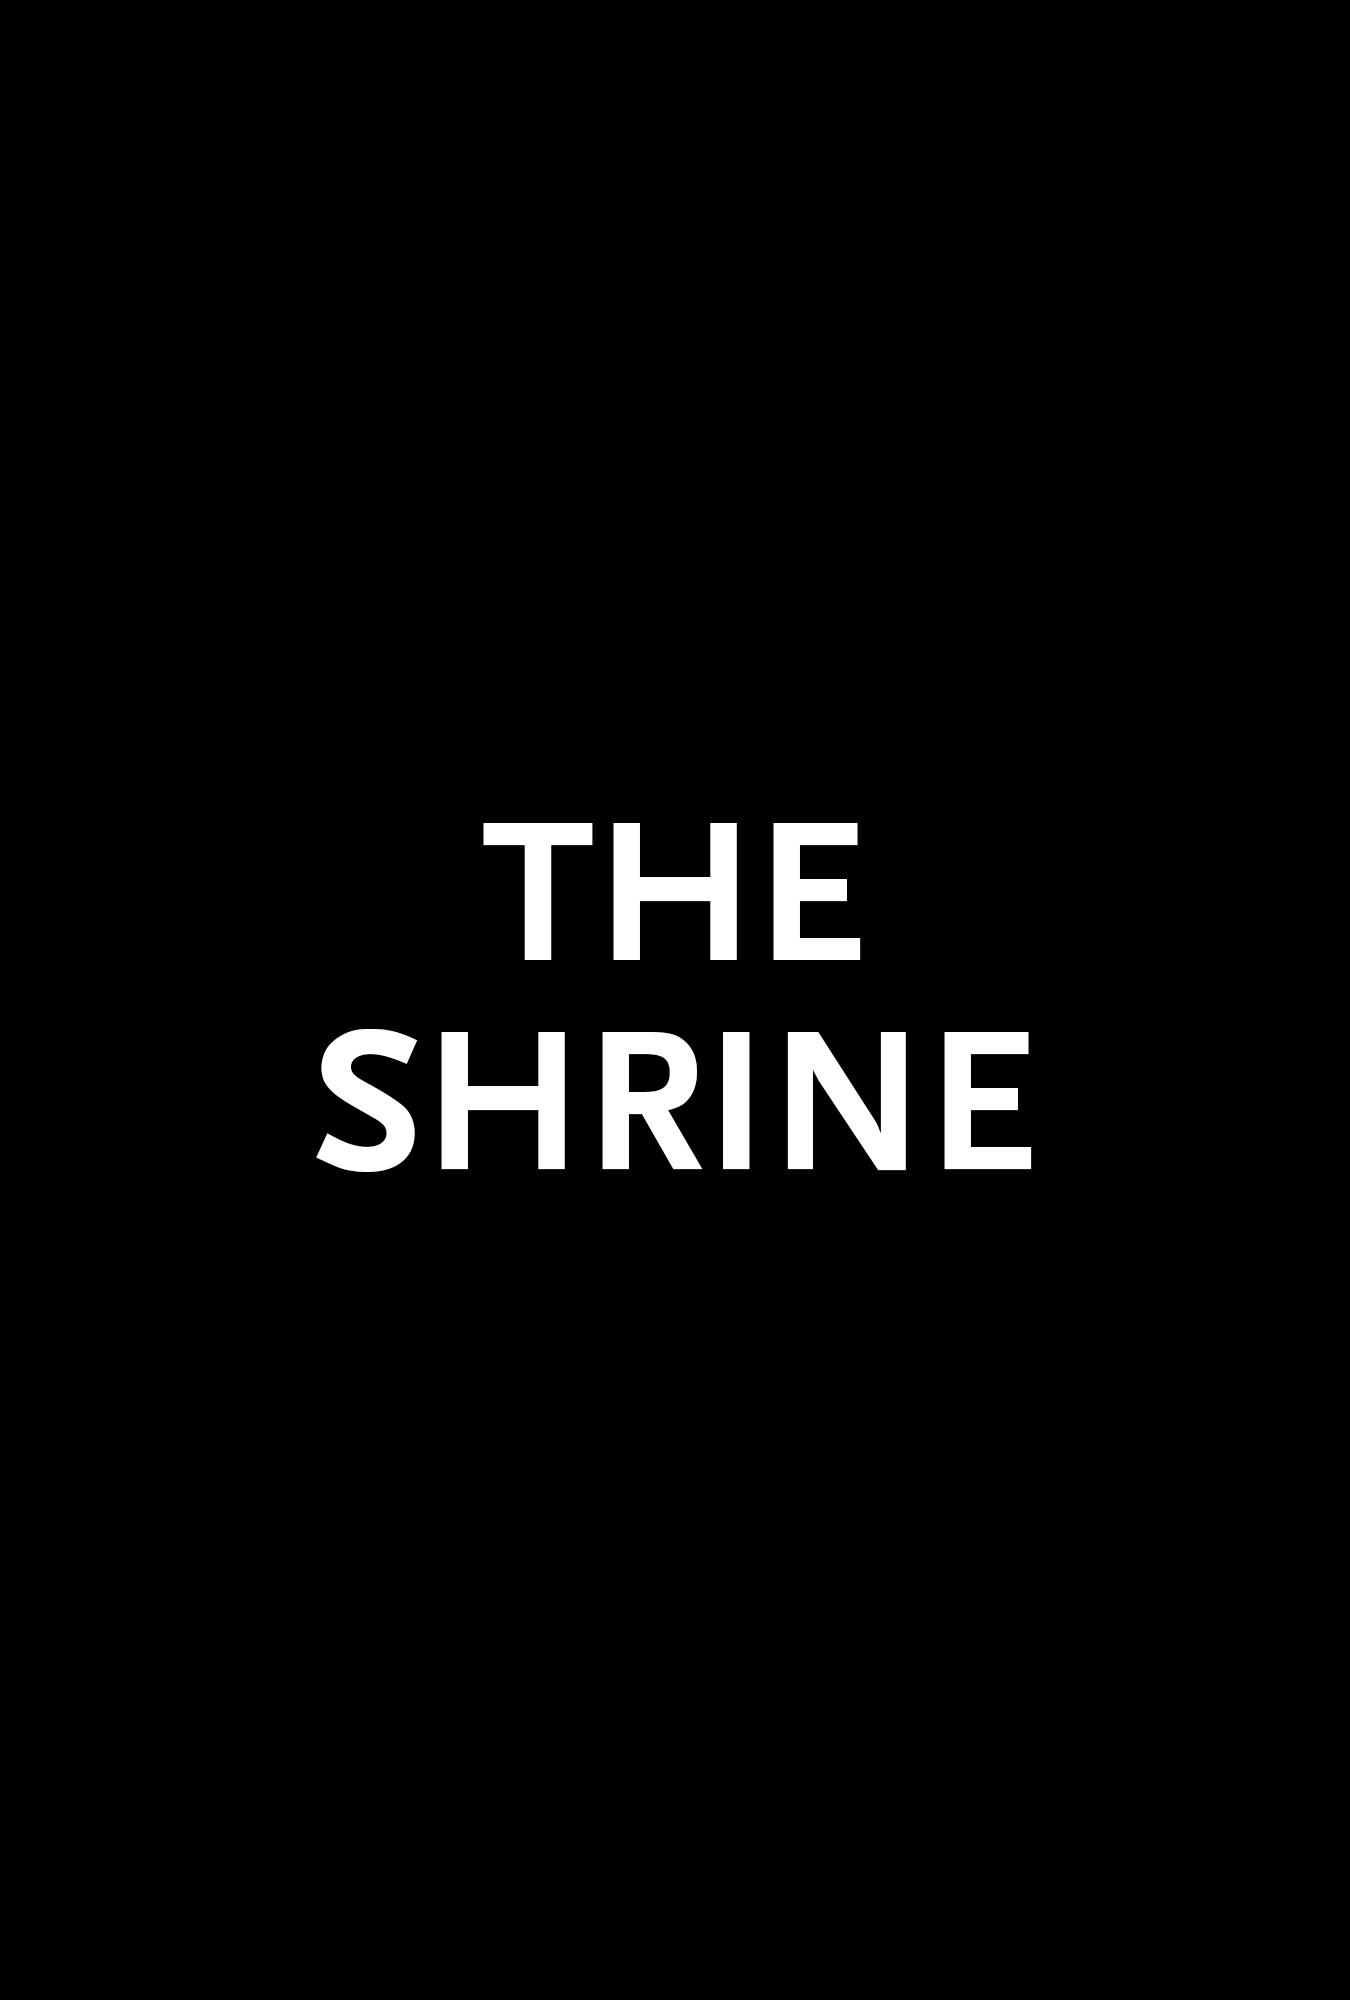 THE SHRINE - Carnaby International Sales & Distribution - UK Film